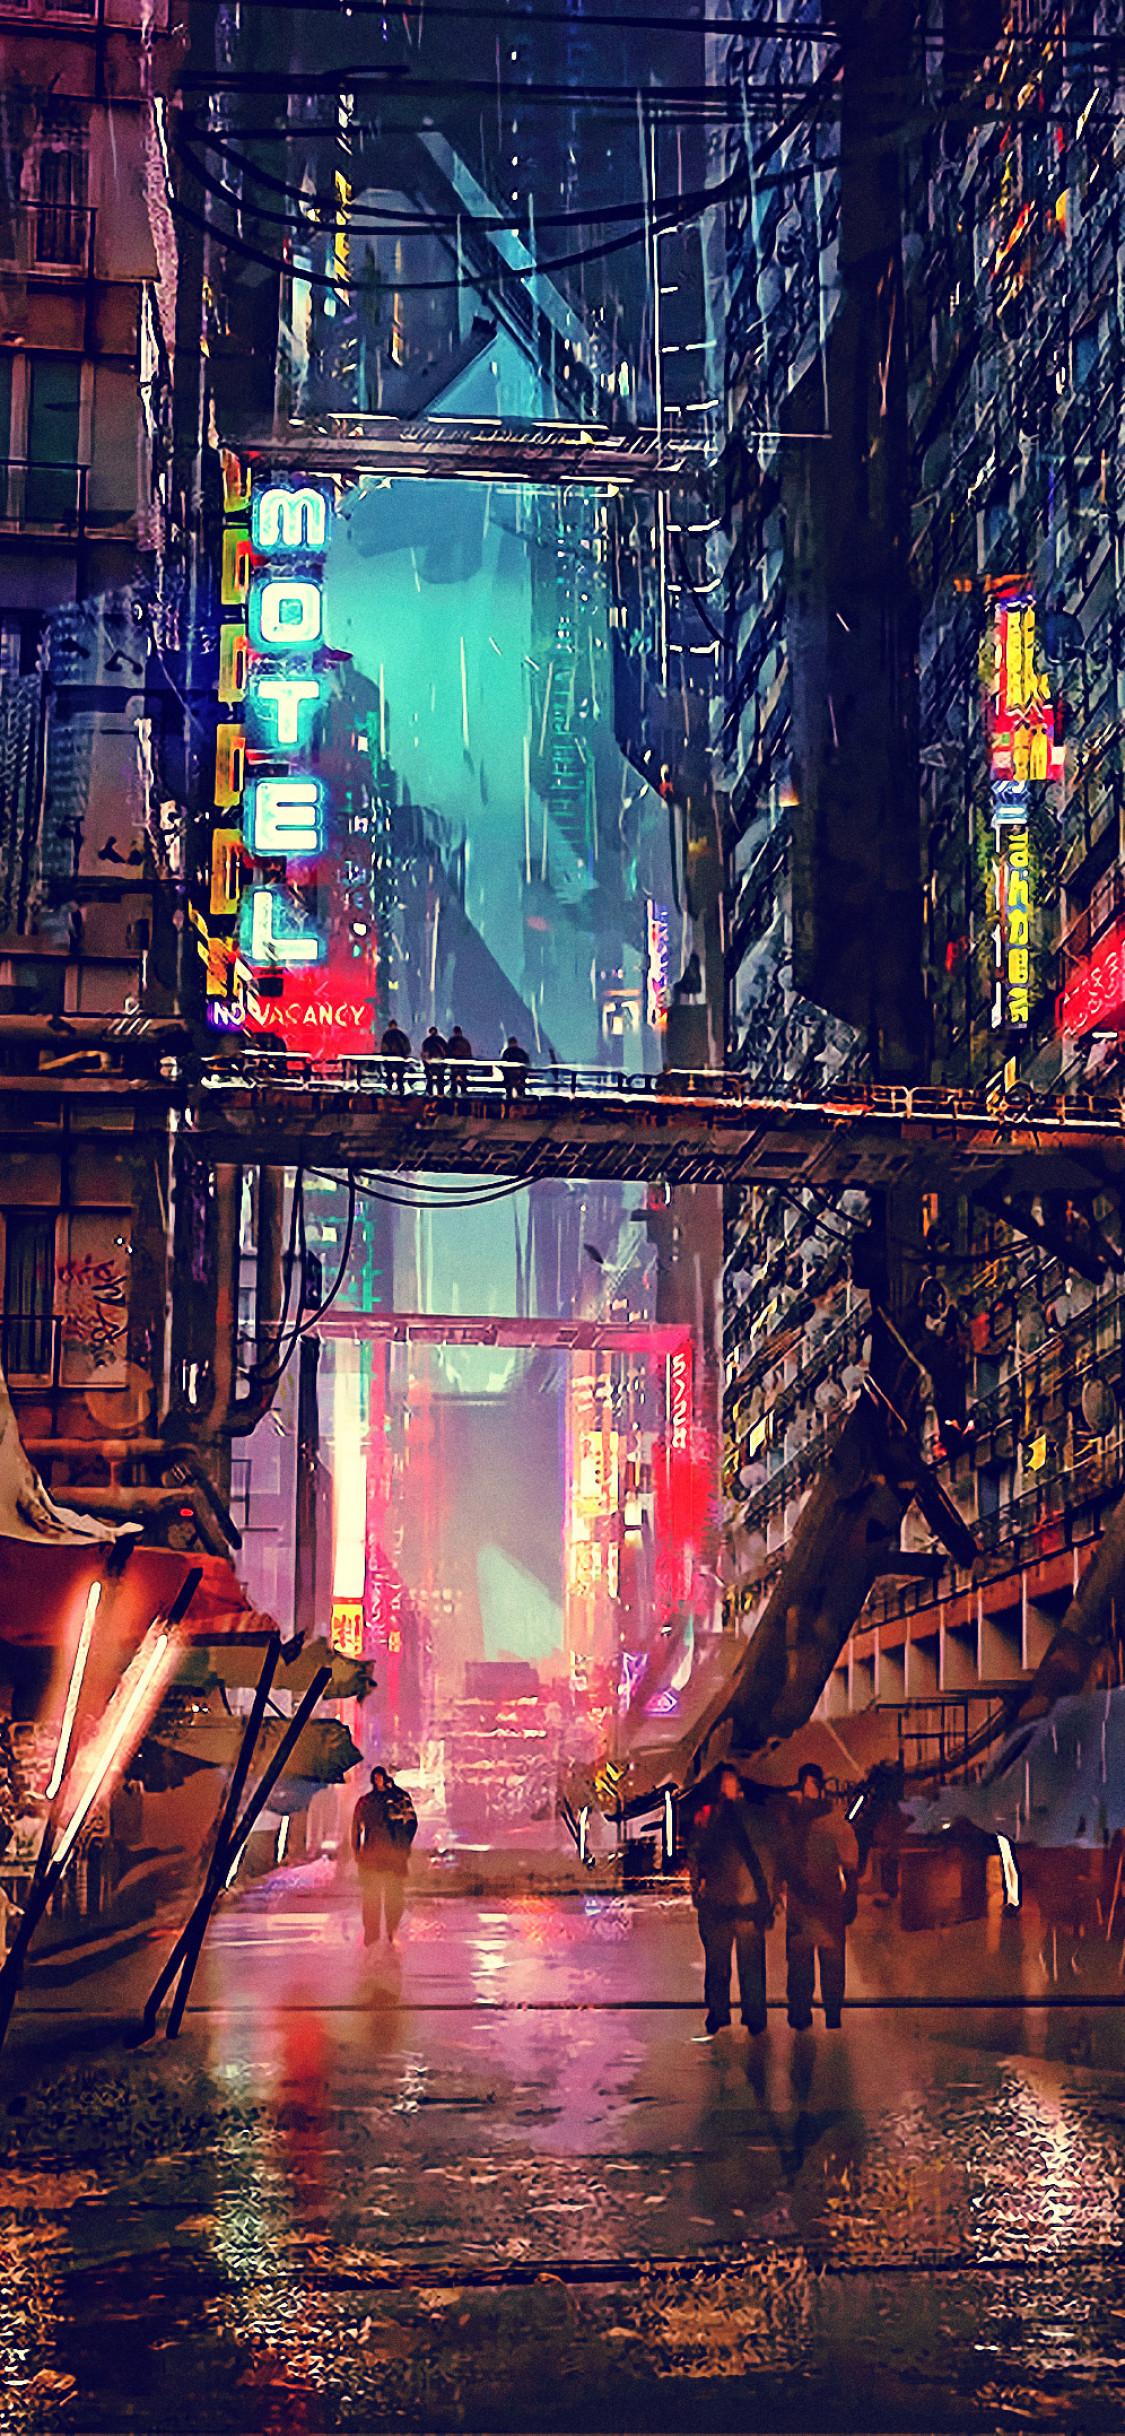 Cyberpunk Ghost In The Shell 1125x2436 Wallpaper Teahub Io